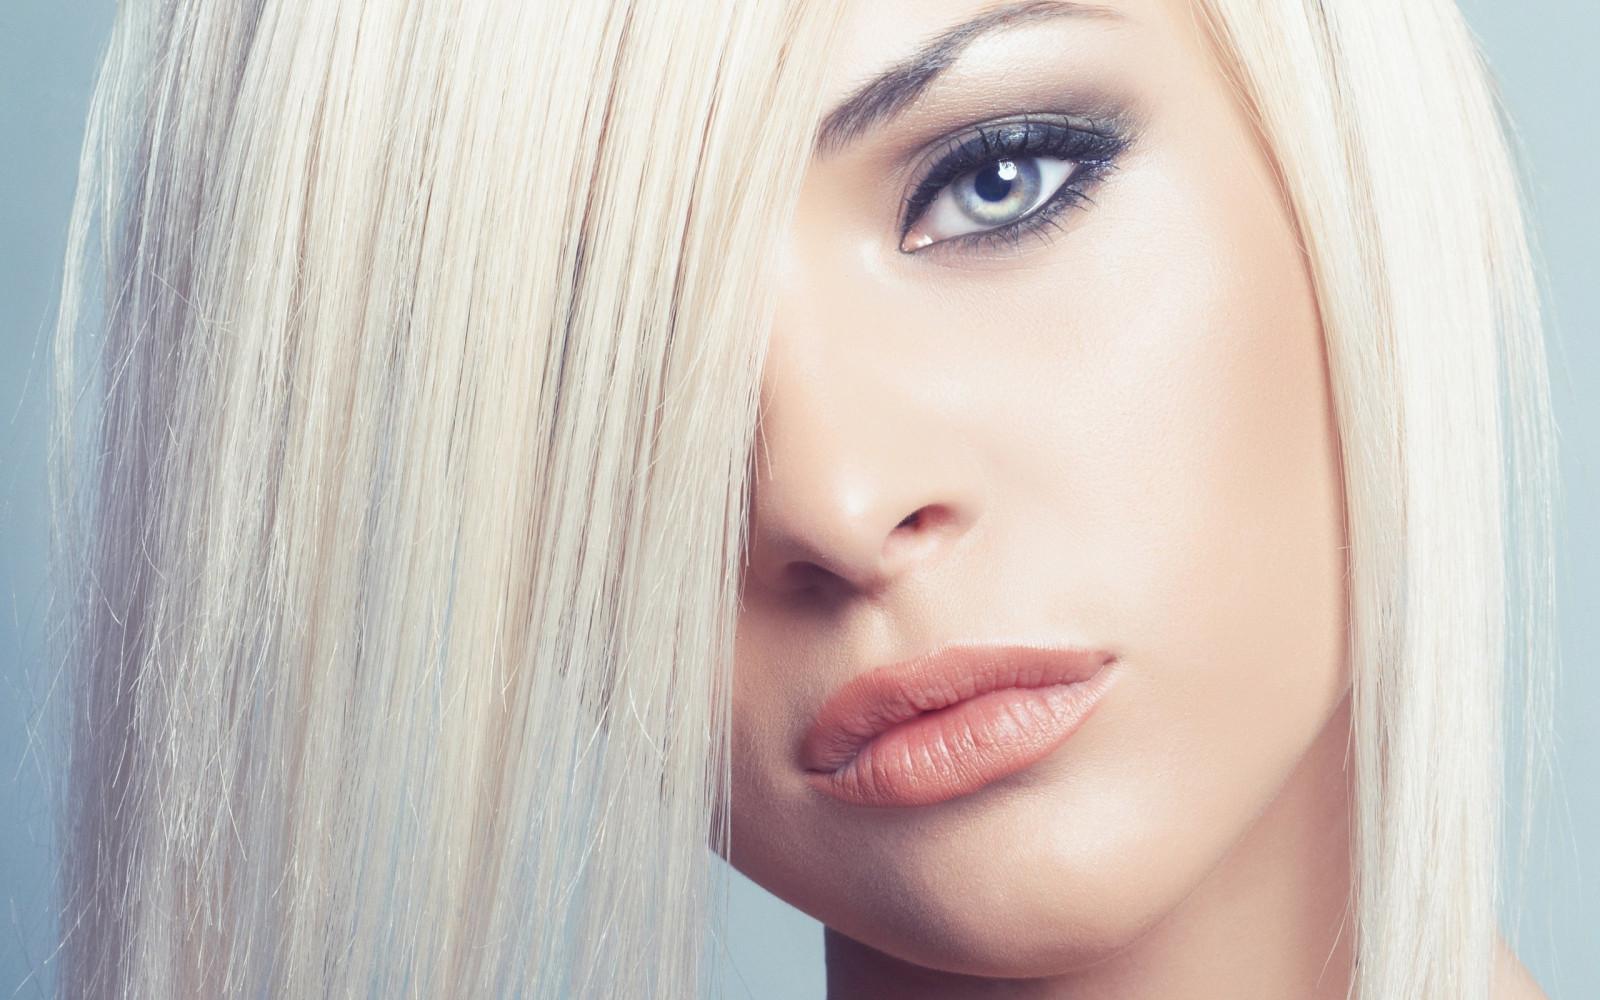 Wallpaper Face Model Blonde Long Hair Blue Eyes: Wallpaper : Face, Women, Model, Portrait, Long Hair, Blue